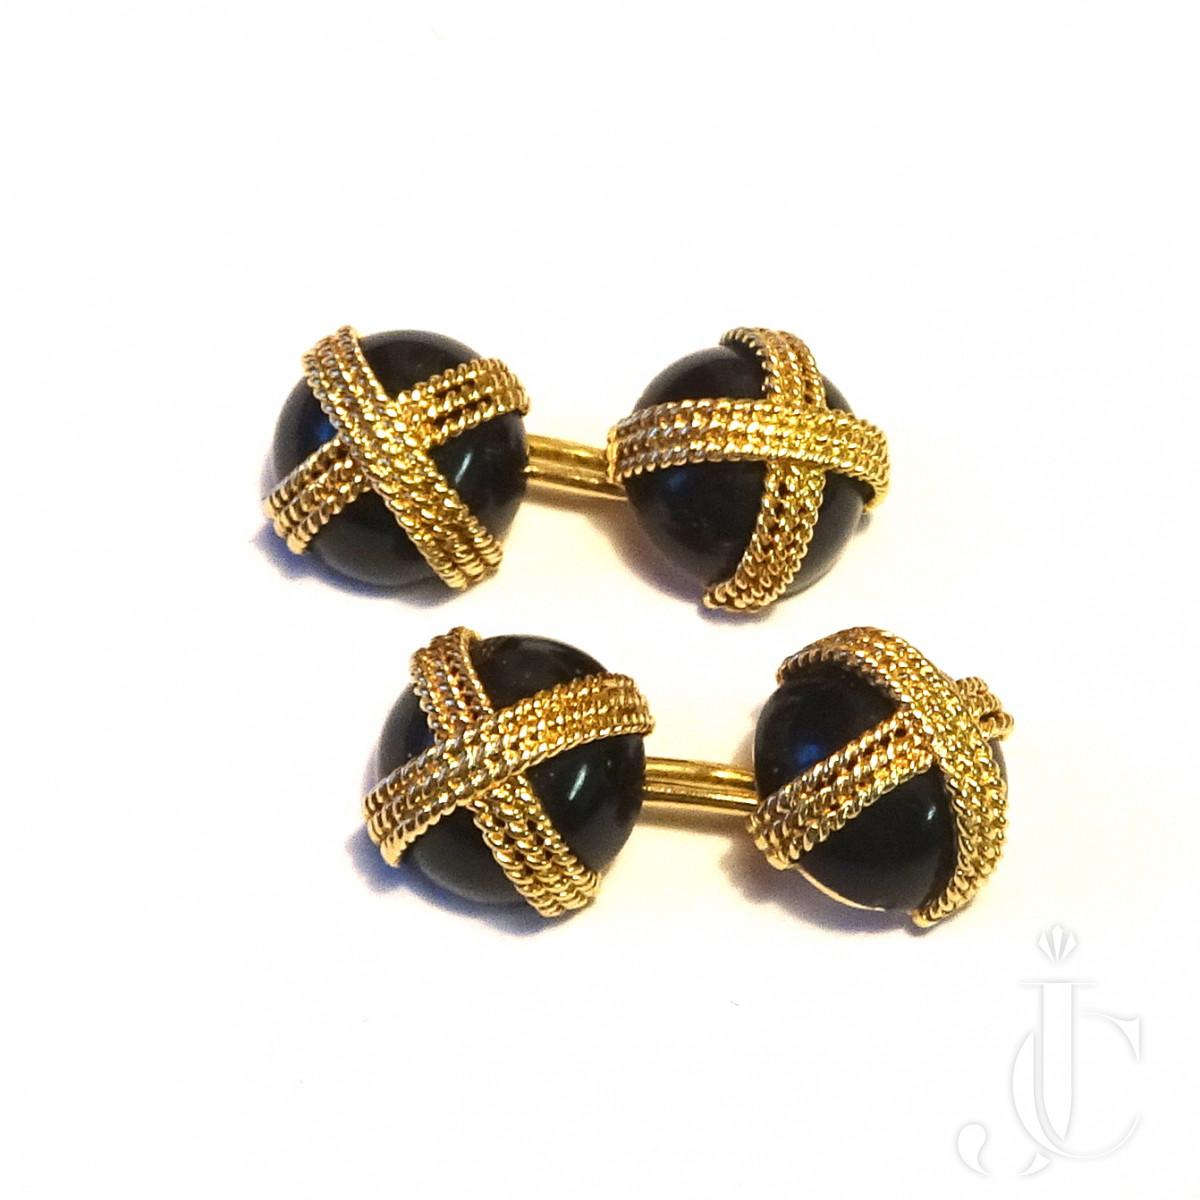 VCA Onyx Gold Cufflinks